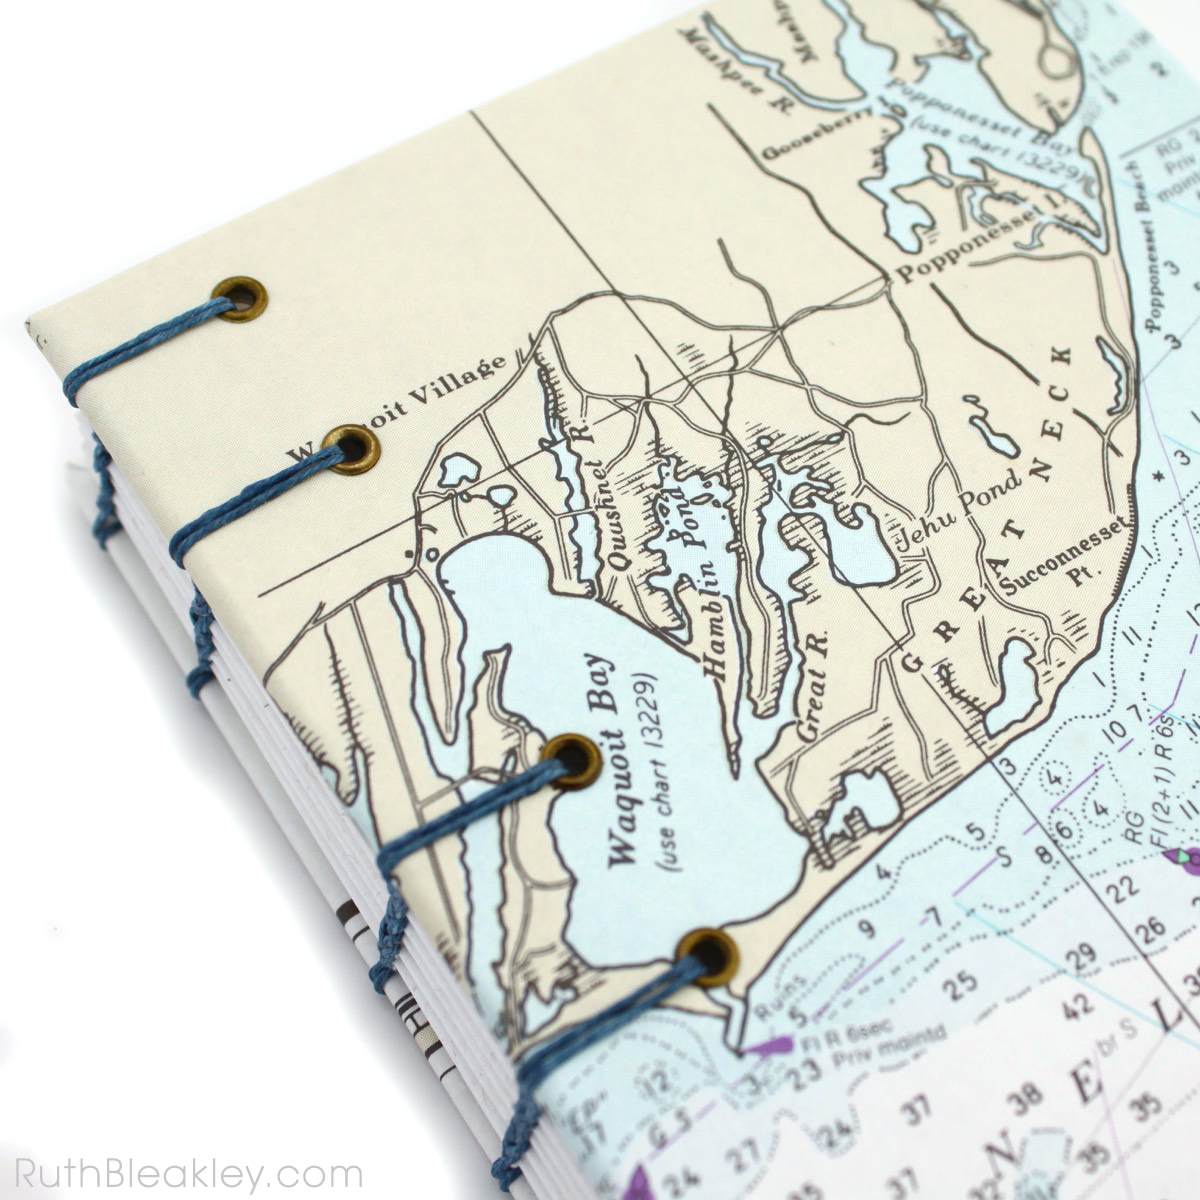 Waquoit Bay Cape Cod Nautical Chart Journal handmade by Ruth Bleakley - 4